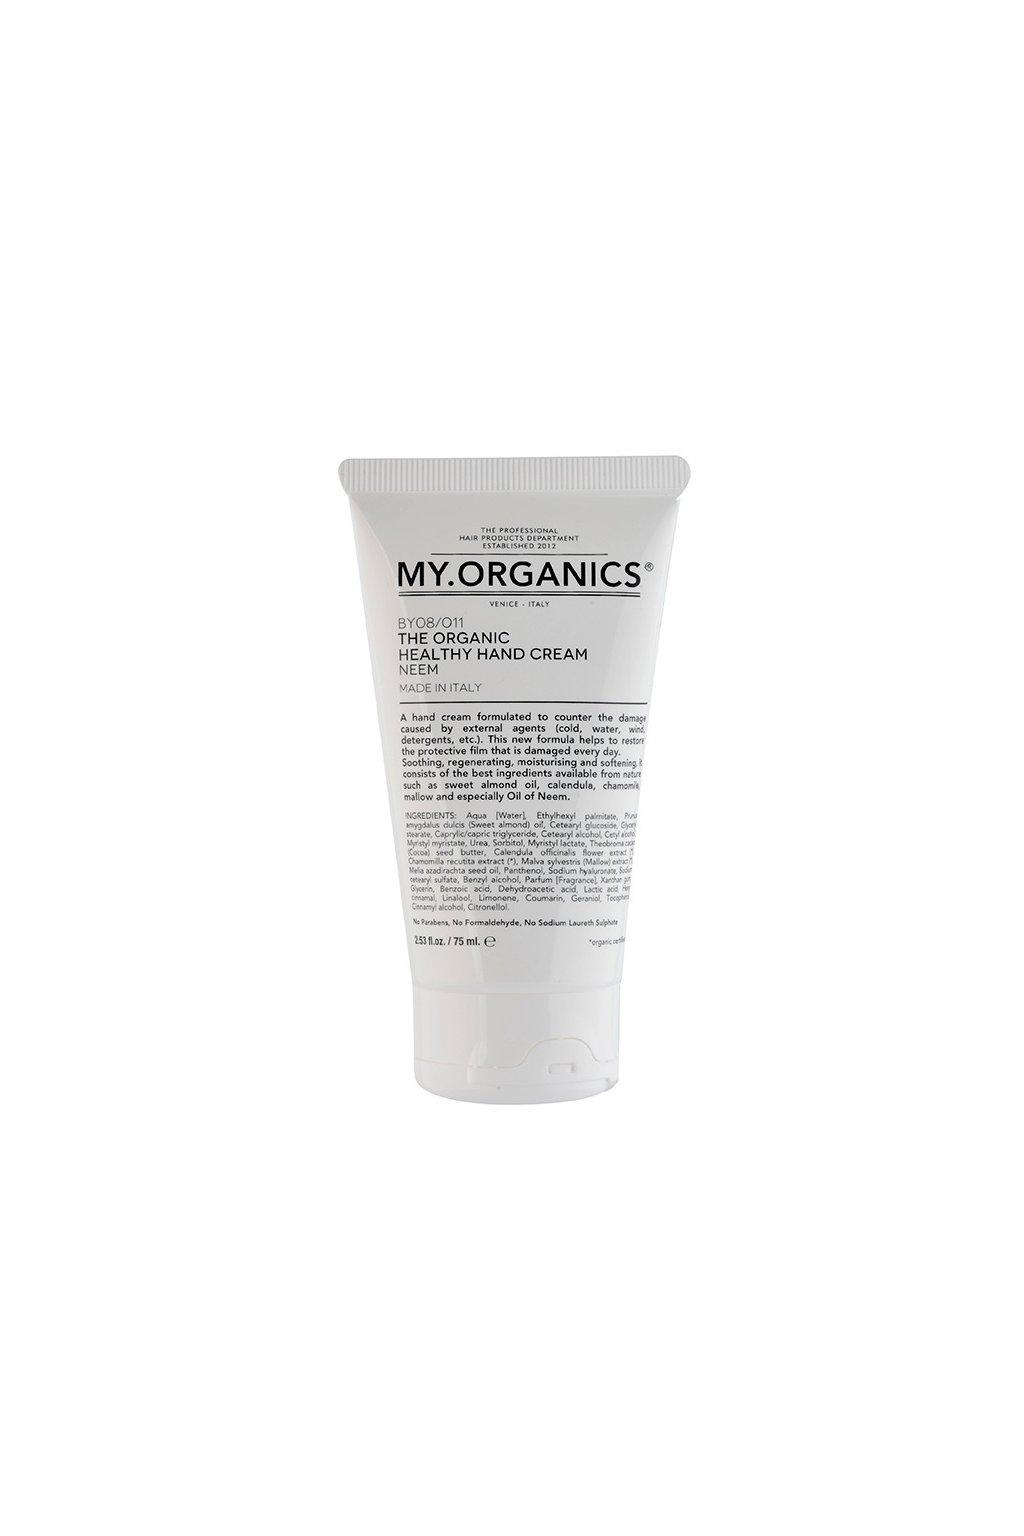 MY.ORGANICS HEALTHY HAND CREAM NEEM